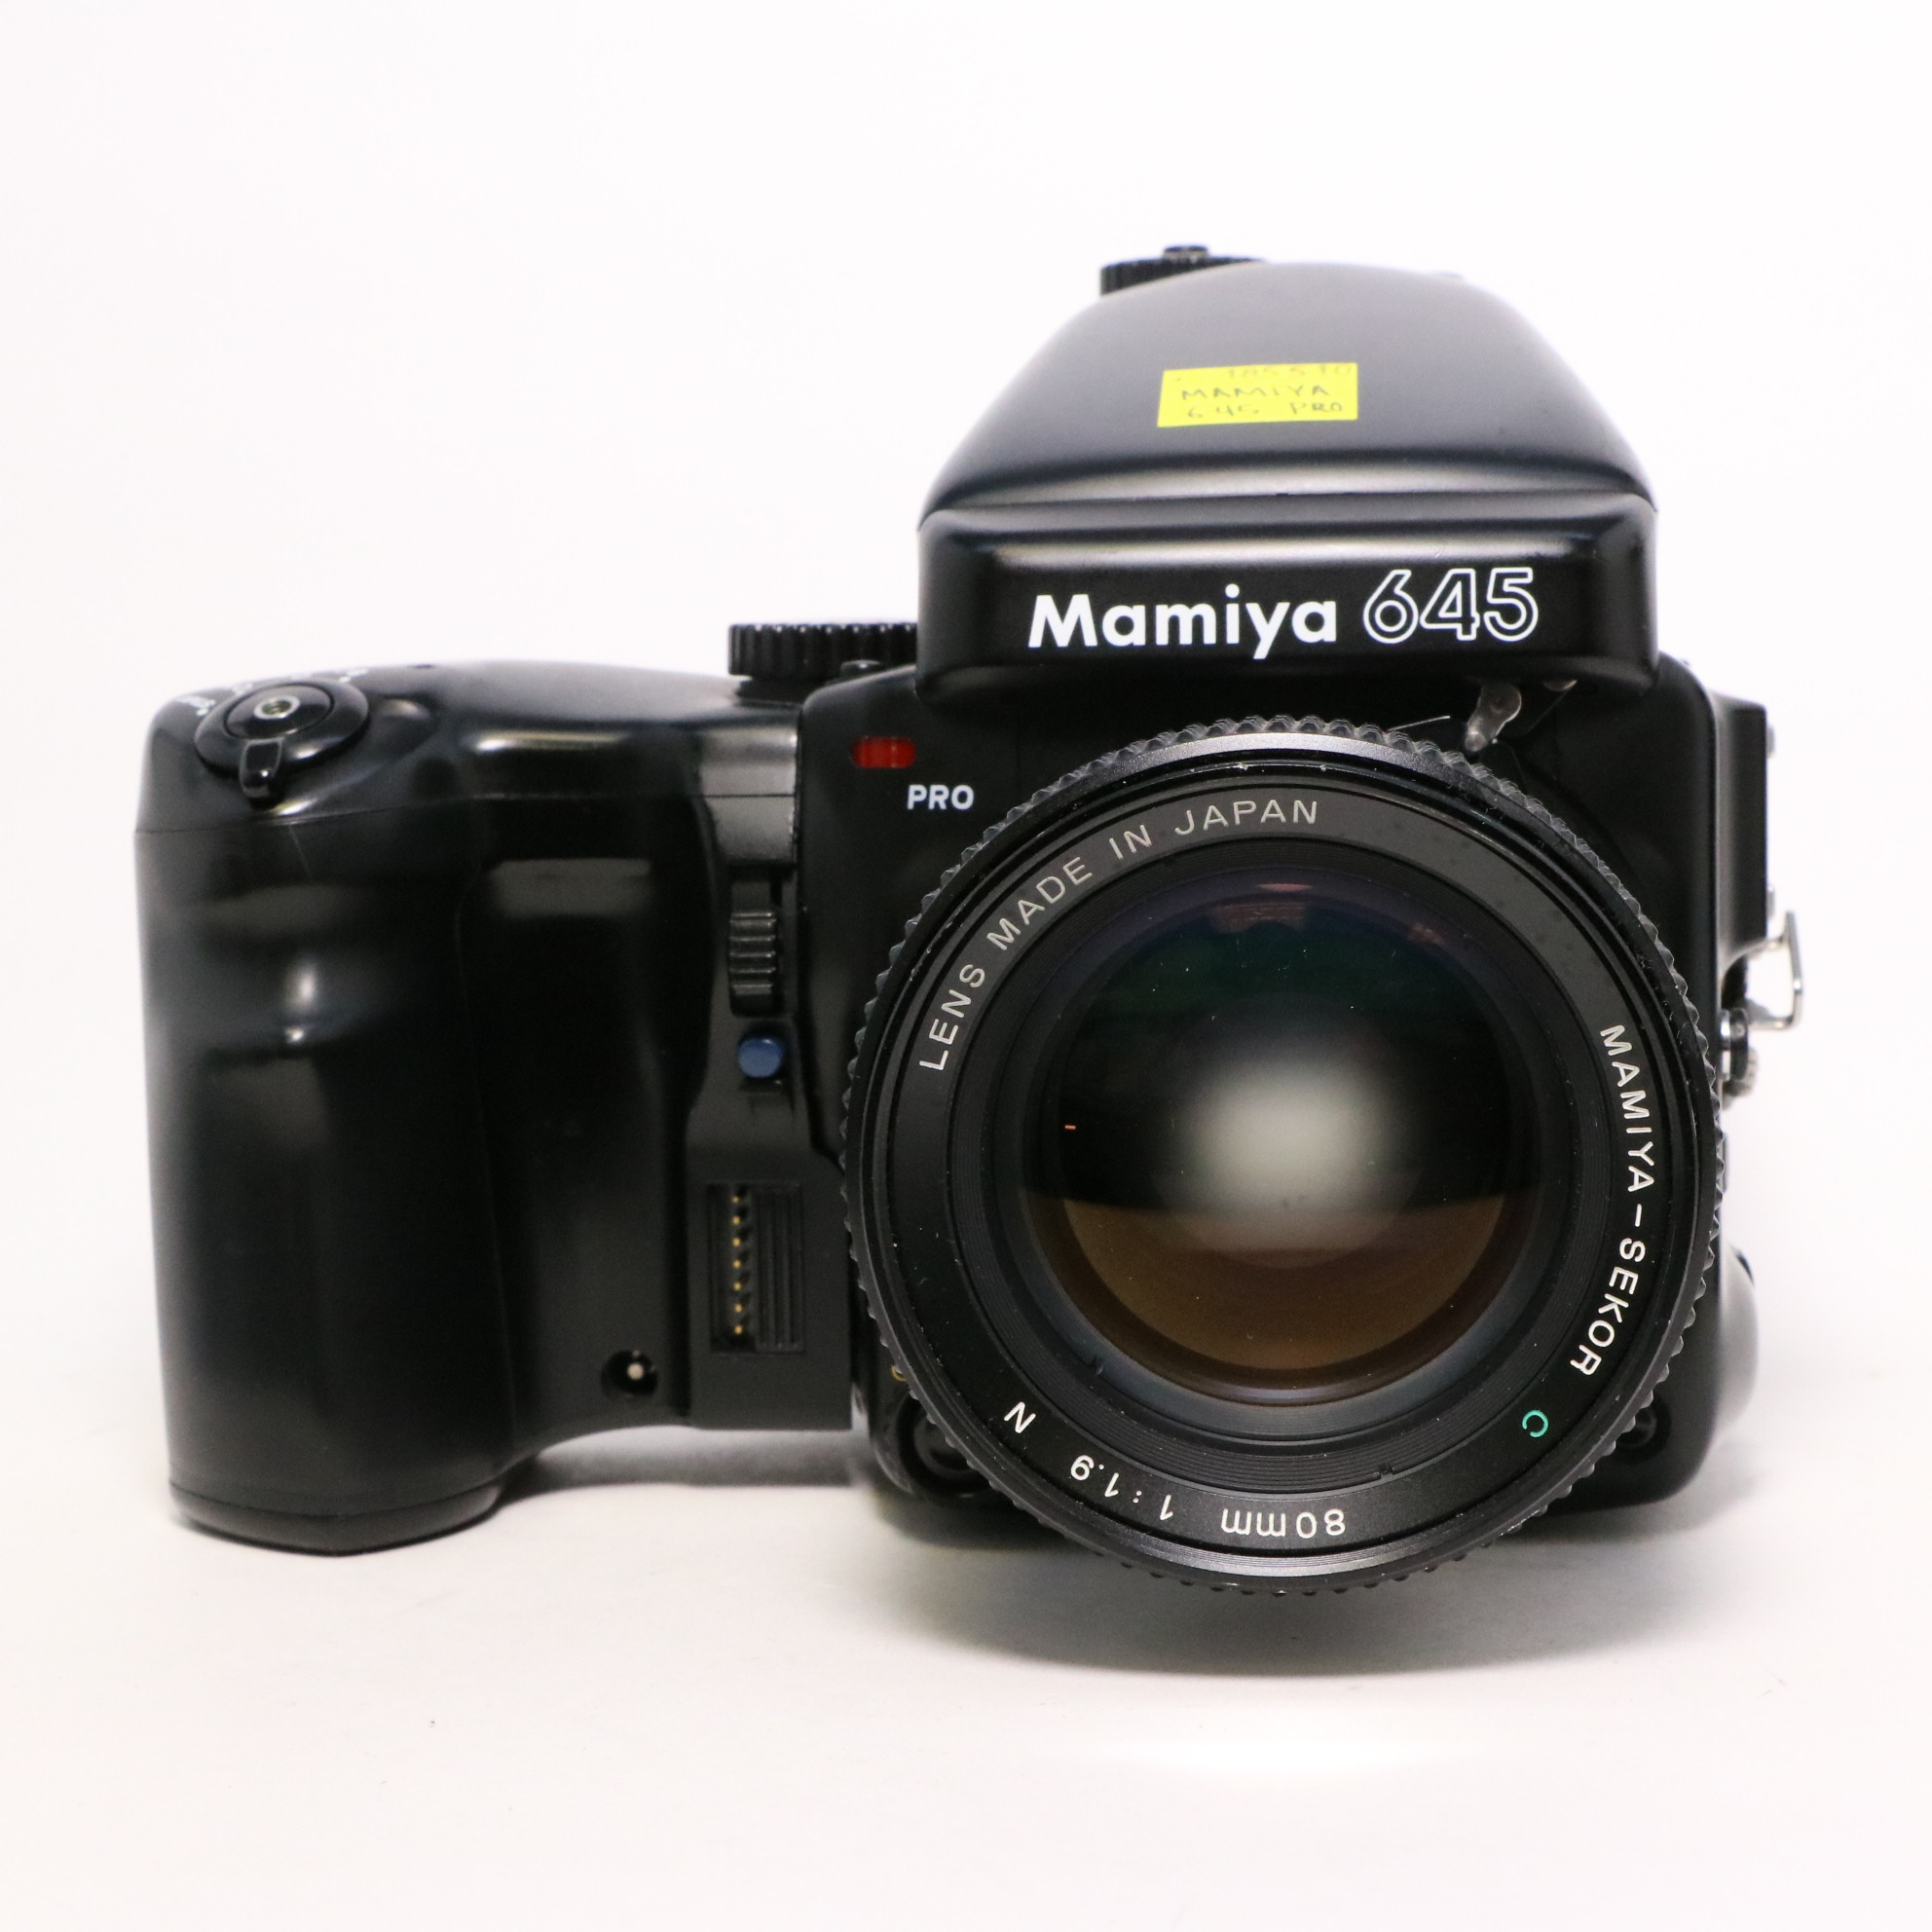 USED Mamiya 645 Pro Medium Format Film Camera w/ 80mm f/1.9 Lens